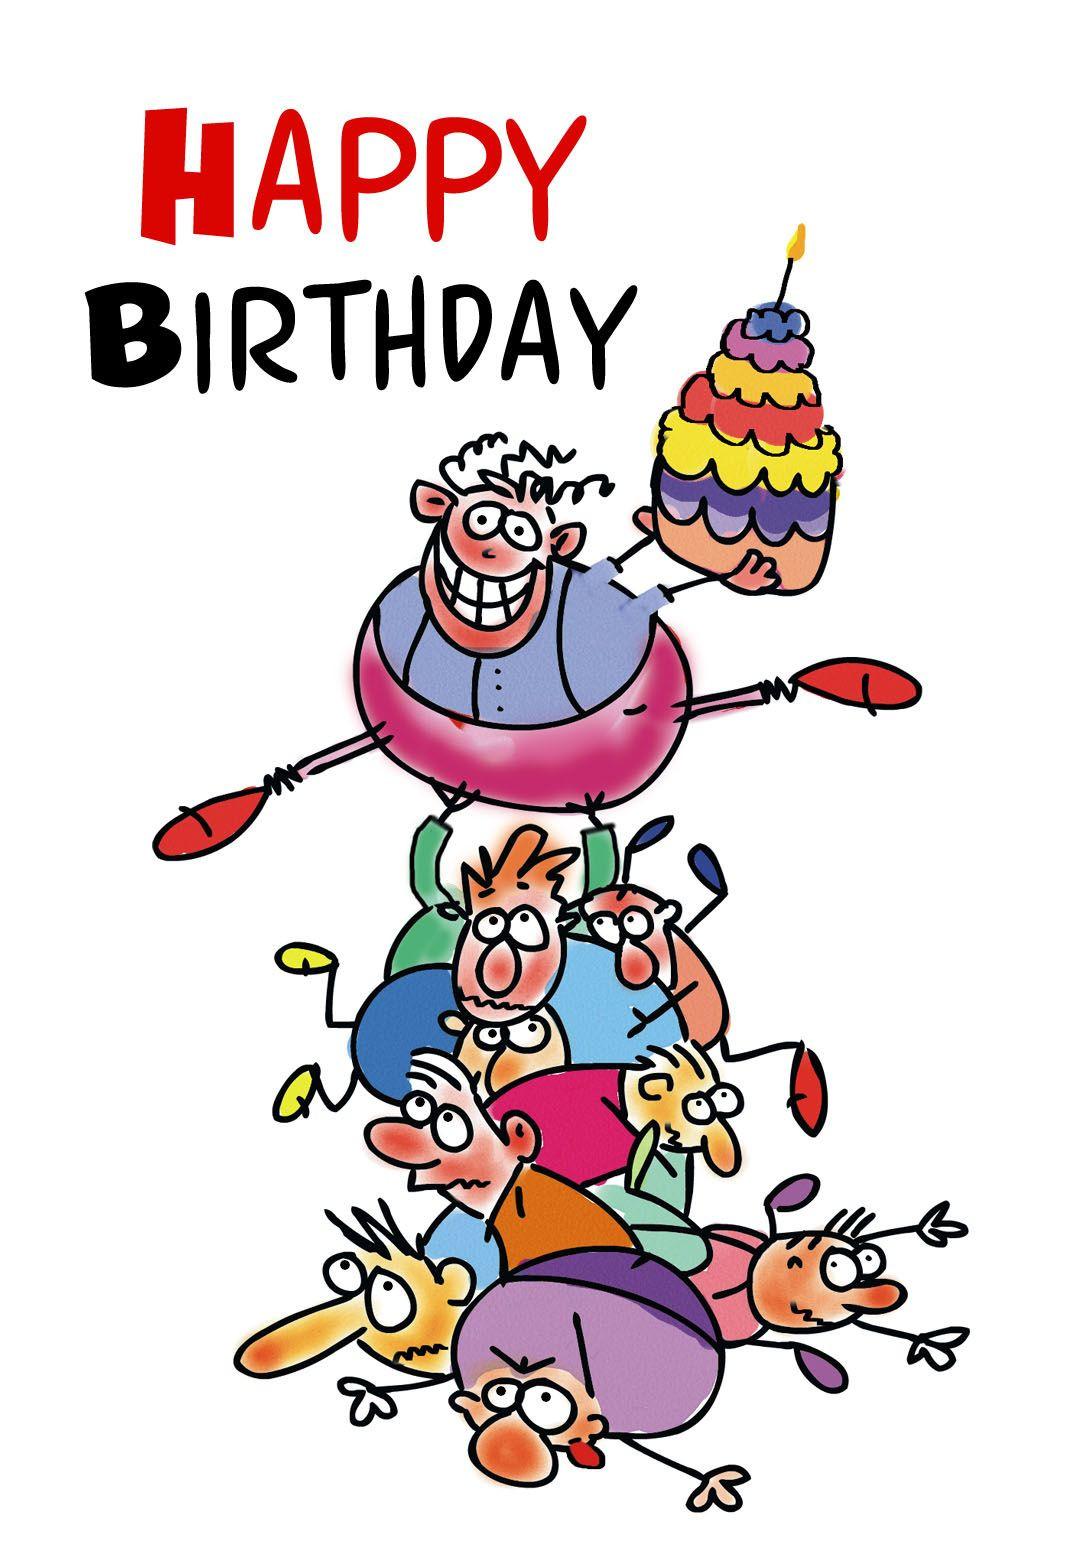 Free Printable Birthday Cards Funny  Free Printable Funny Birthday Greeting Card